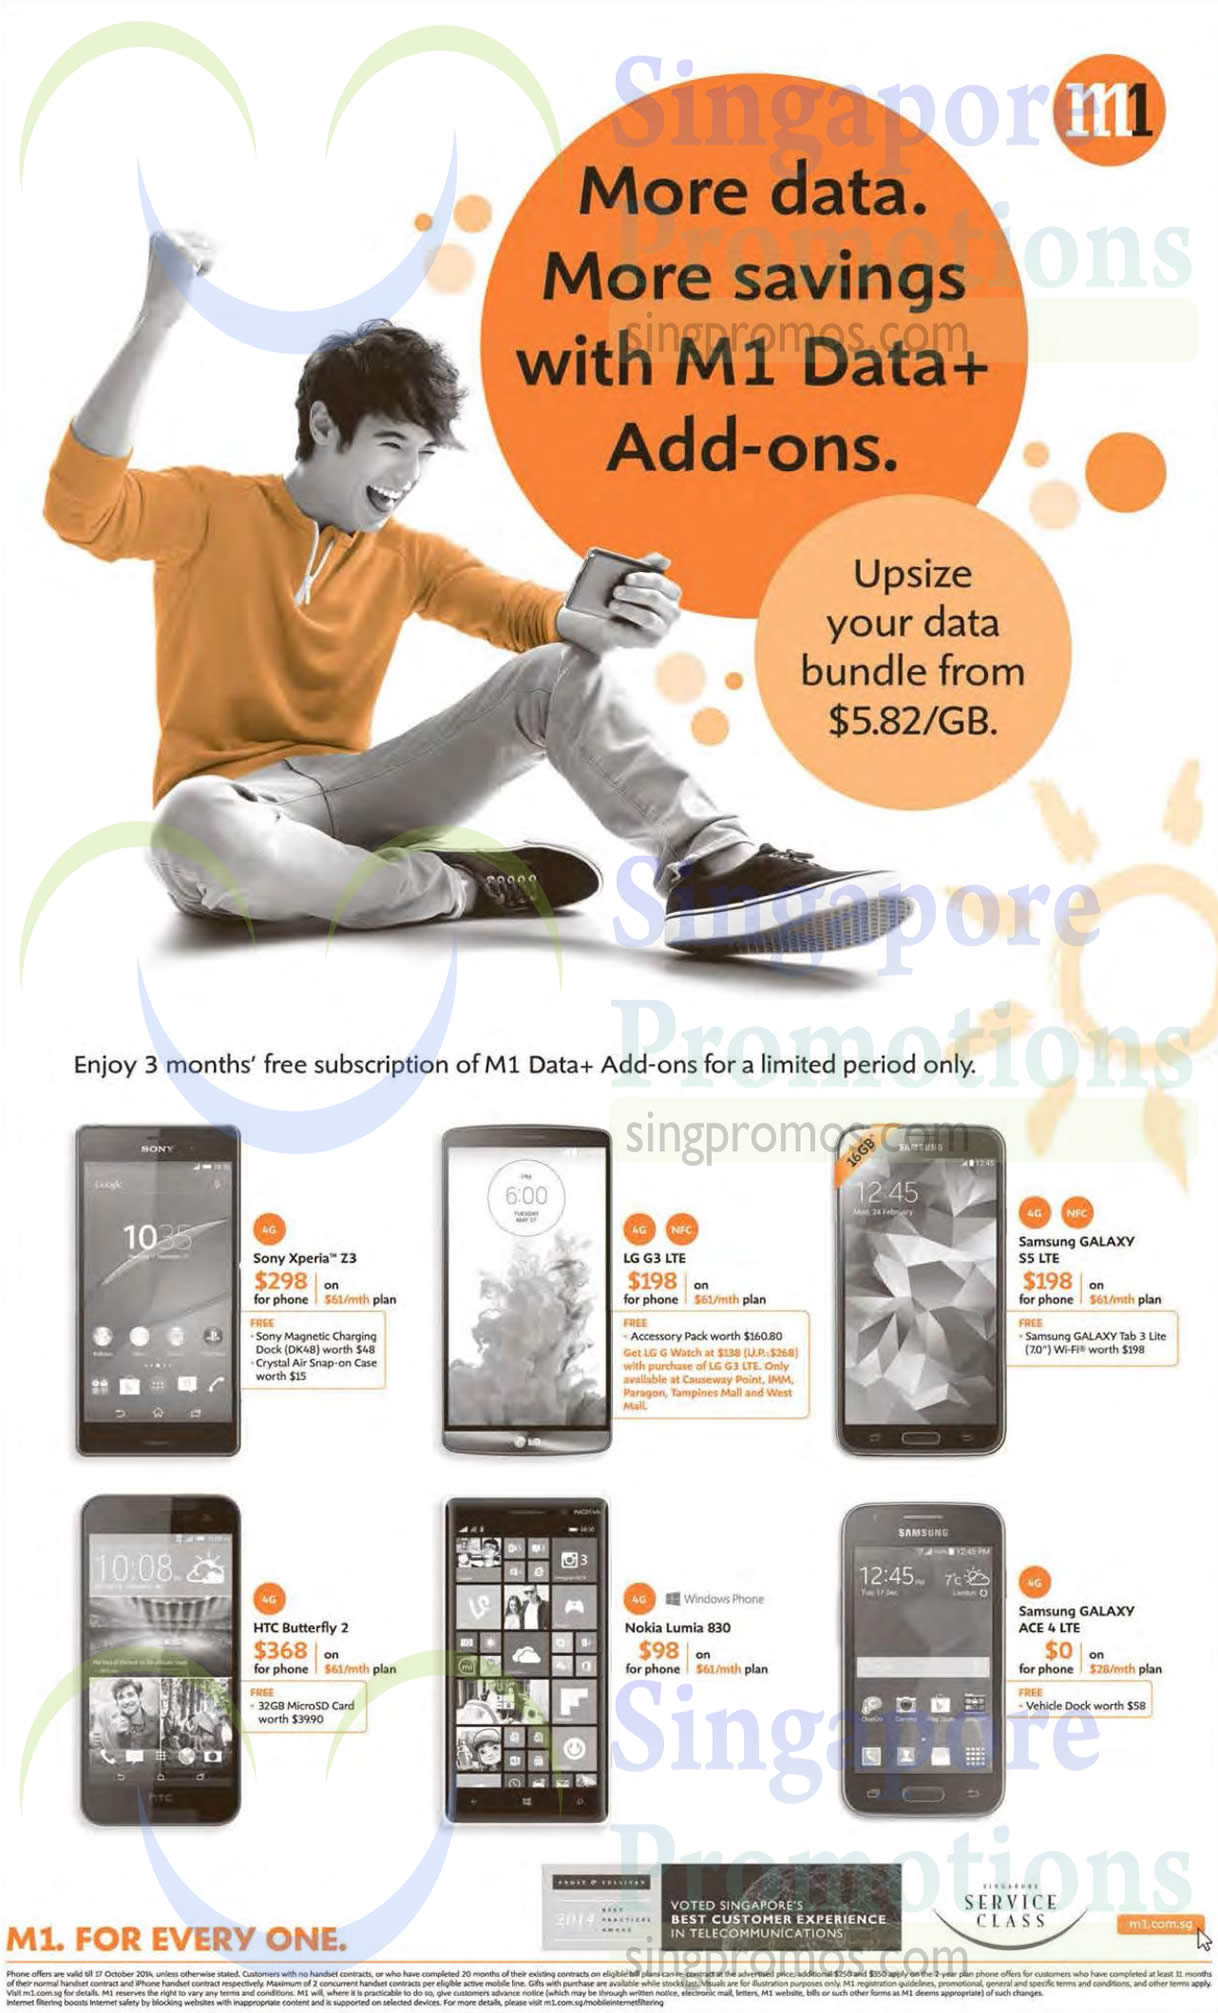 Sony Xperia Z3, HTC Butterfly 2, LG G3, Nokia Lumia 830, Samsung Galaxy S5, Samsung Galaxy Ace 4